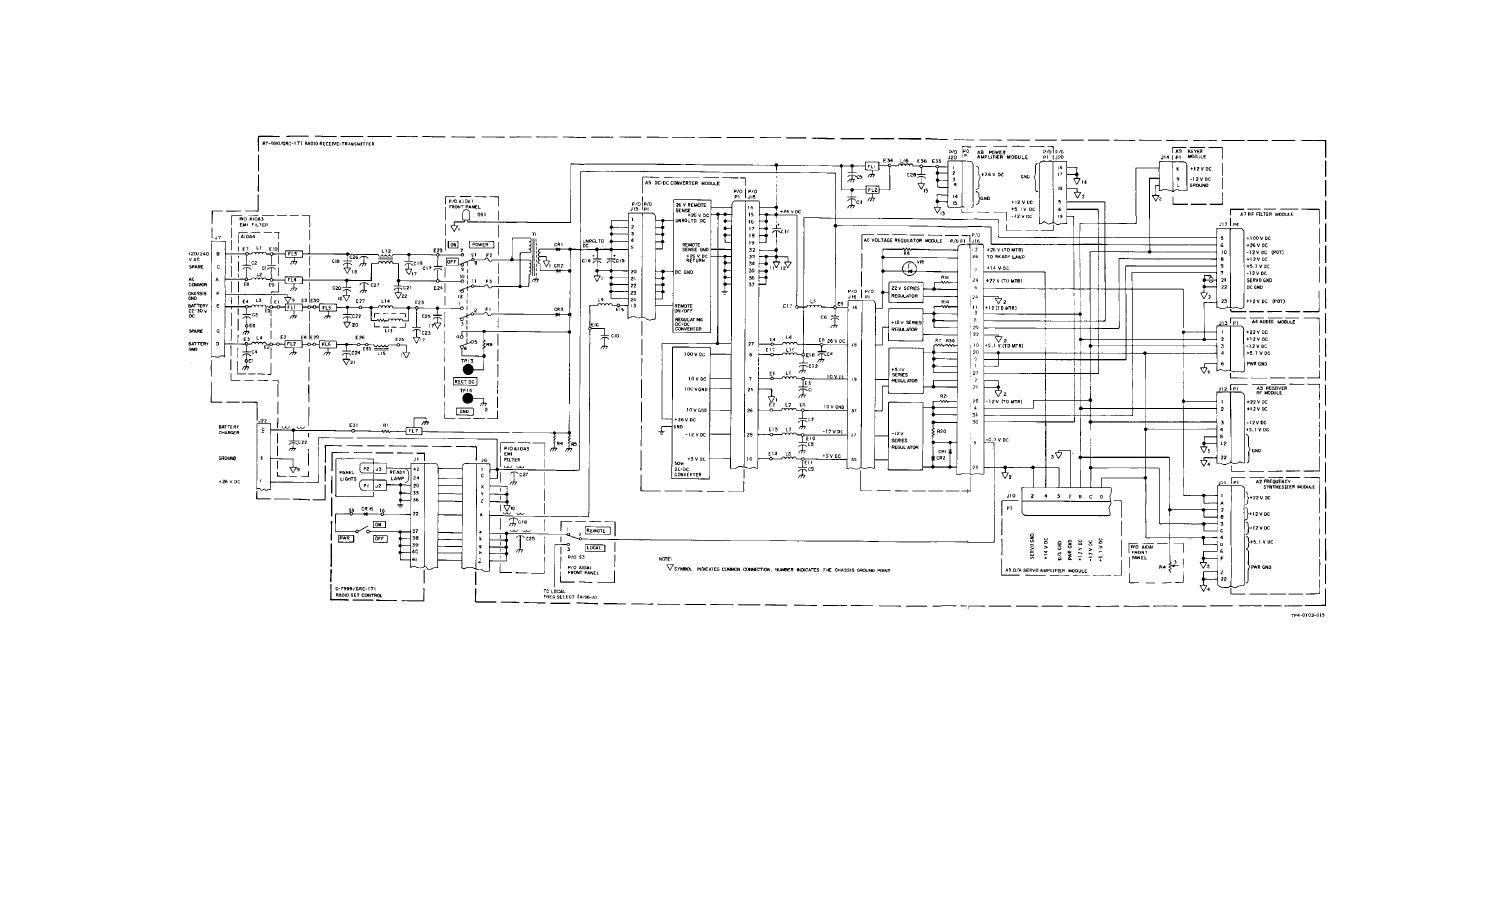 Figure Fo 14 Radio Set An Grc 171 Power Distribution Diagram